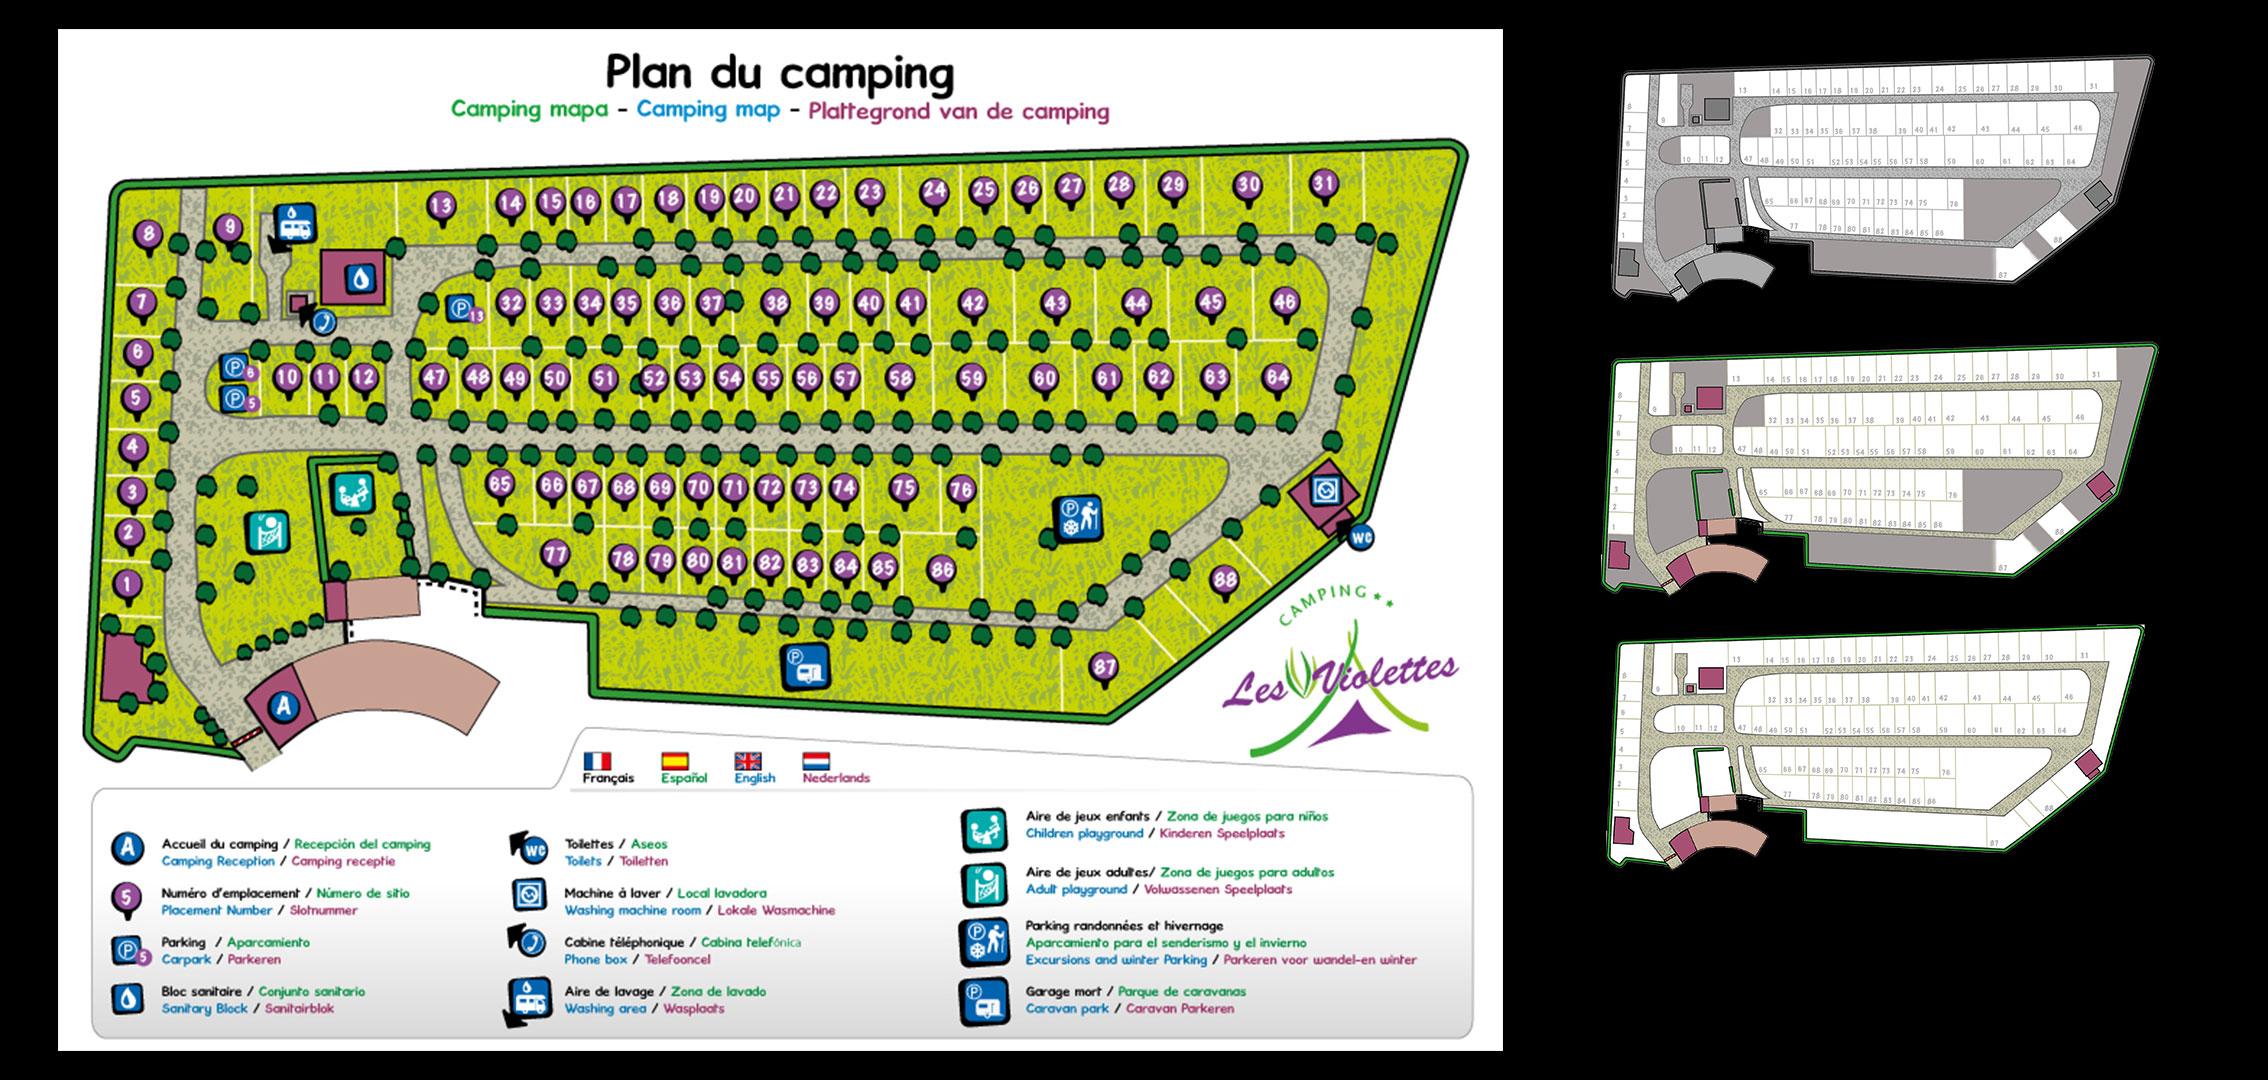 plan d'un camping